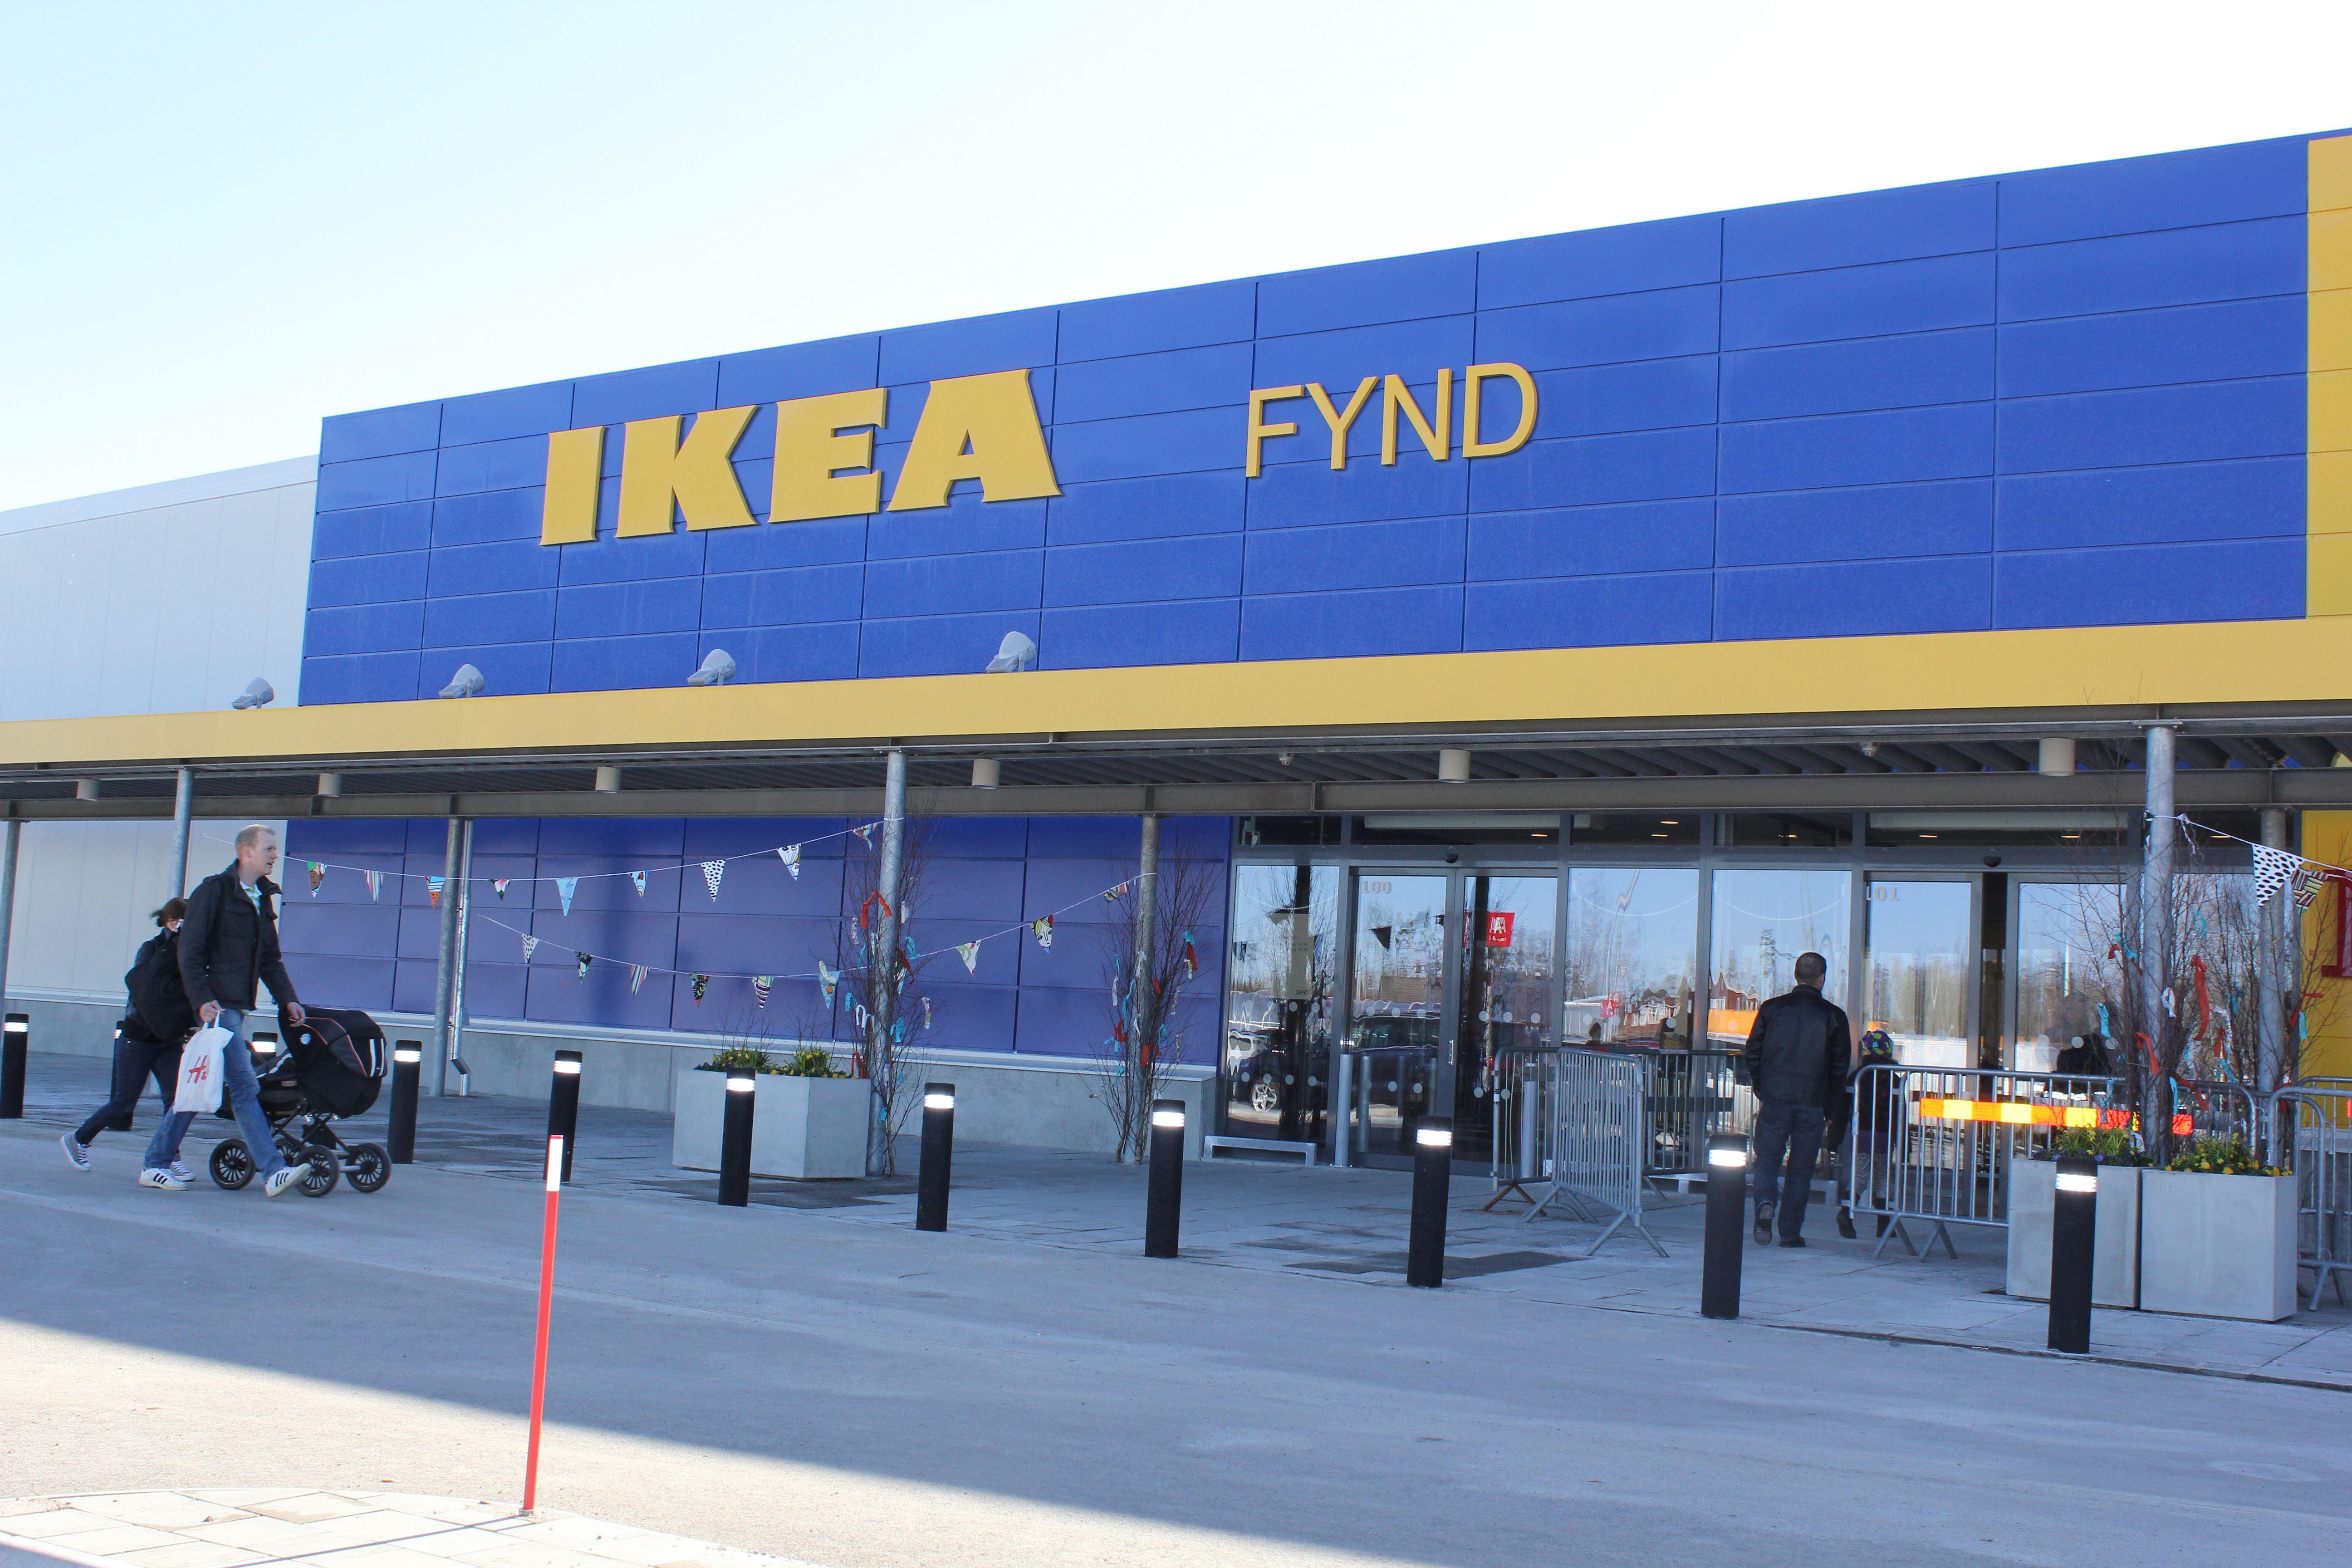 IKEA FYND